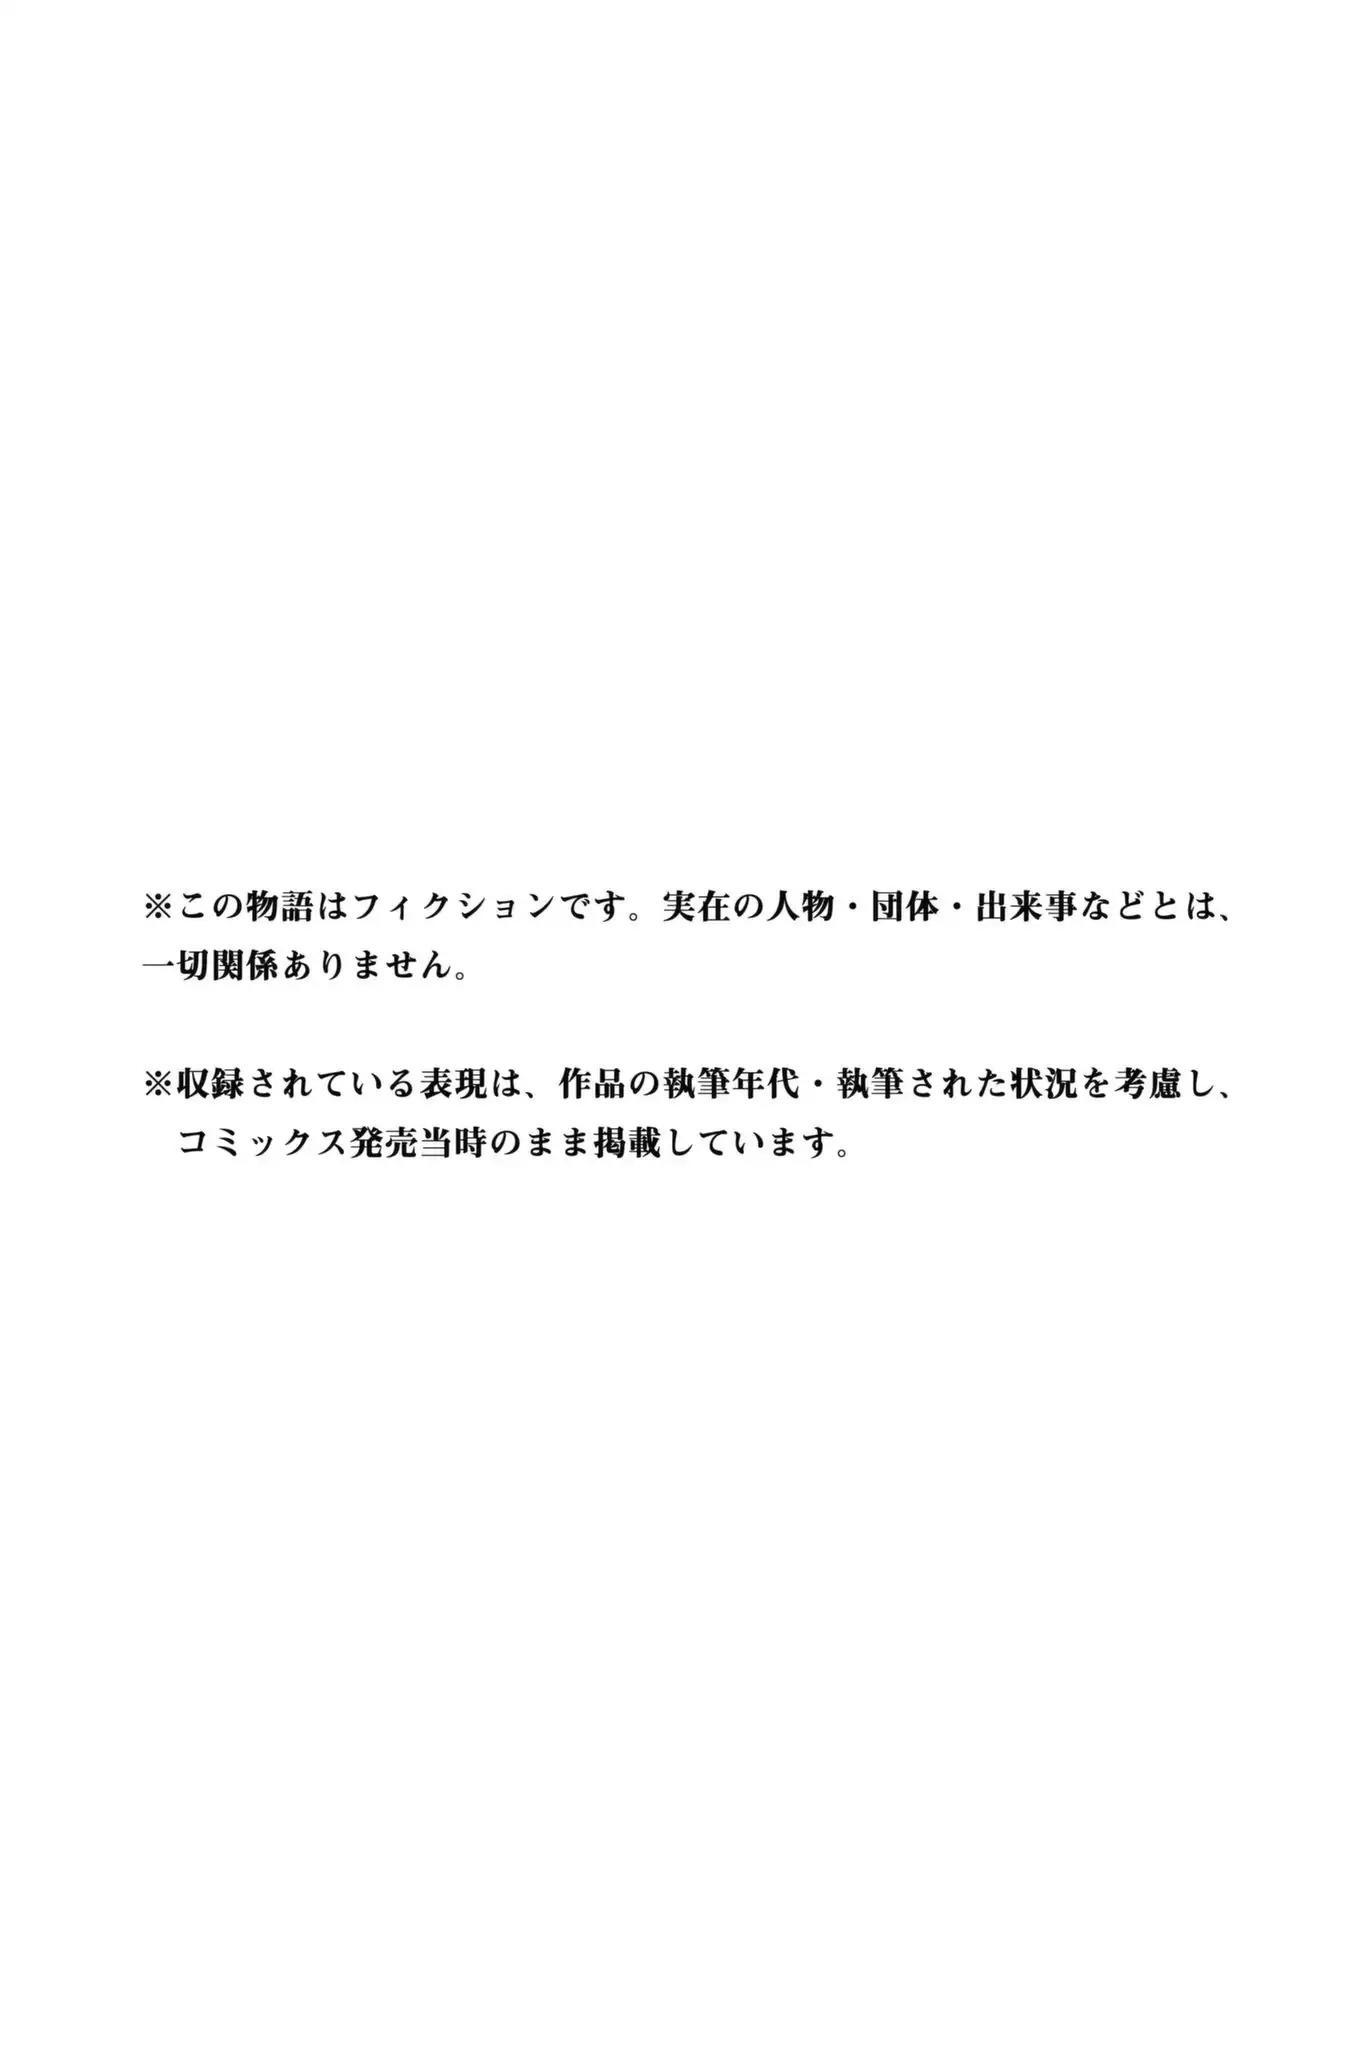 Please Don't Bully Me, Nagatoro Comic Anthology Chapter 1 page 35 - Mangakakalot